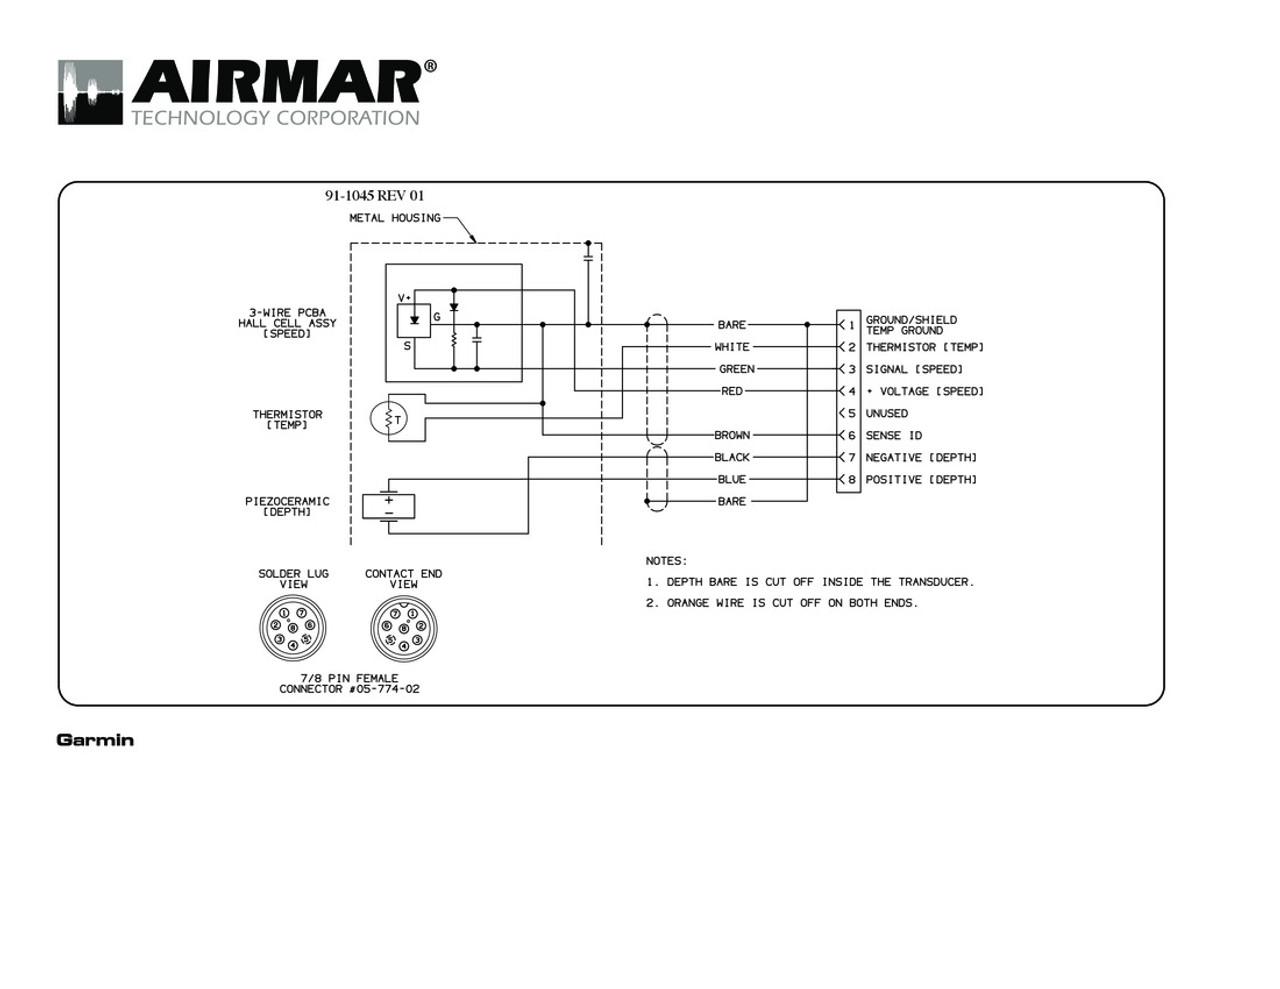 hight resolution of airmar wiring diagram garmin b744 8 pin d s t blue bottle marine garmin marine wiring diagrams